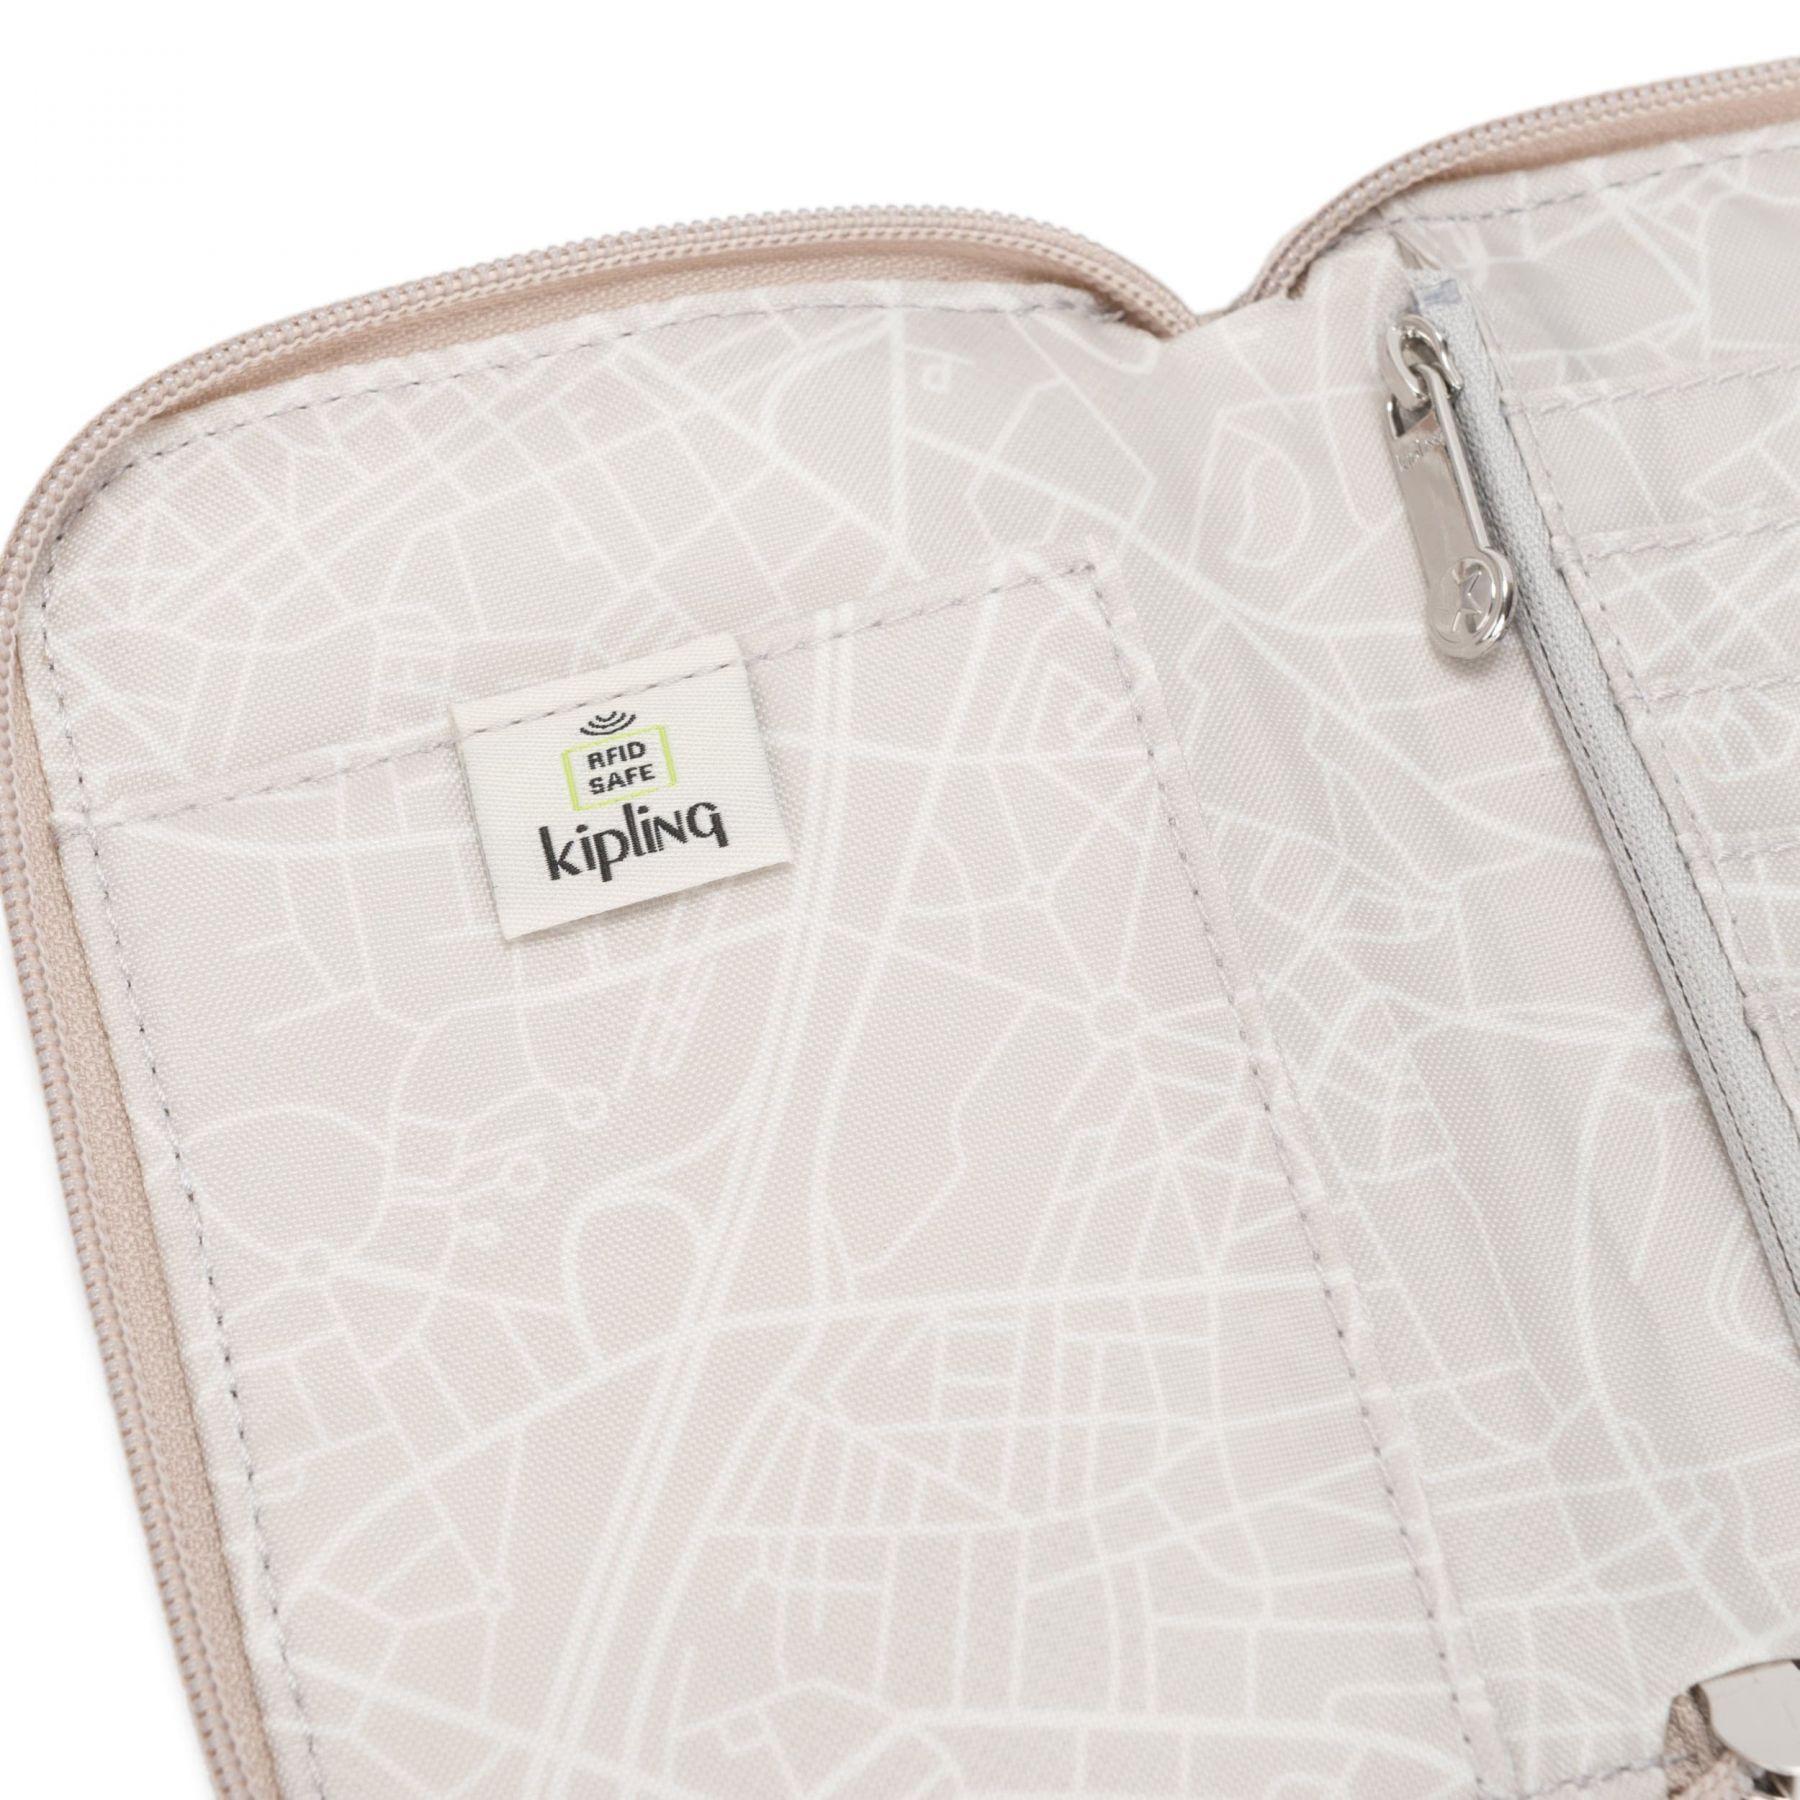 Portafoglio Kipling | Portafogli | TRAVELDOCWRISTMETALLICGLOW